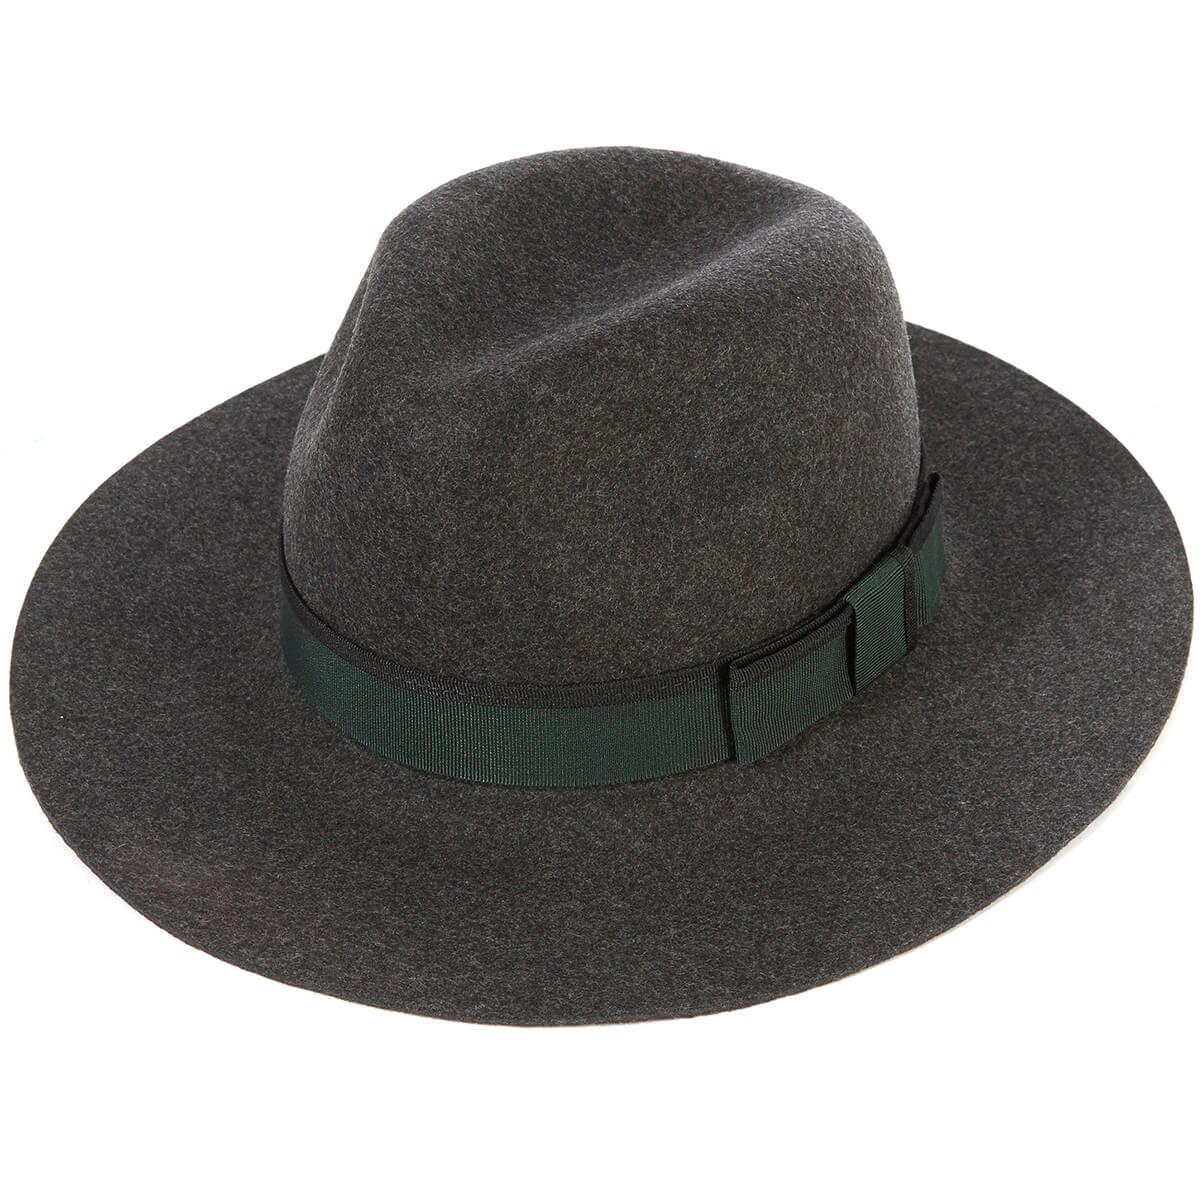 Soho Trilby Hat - MIXG-Charcoal Mi in size 57